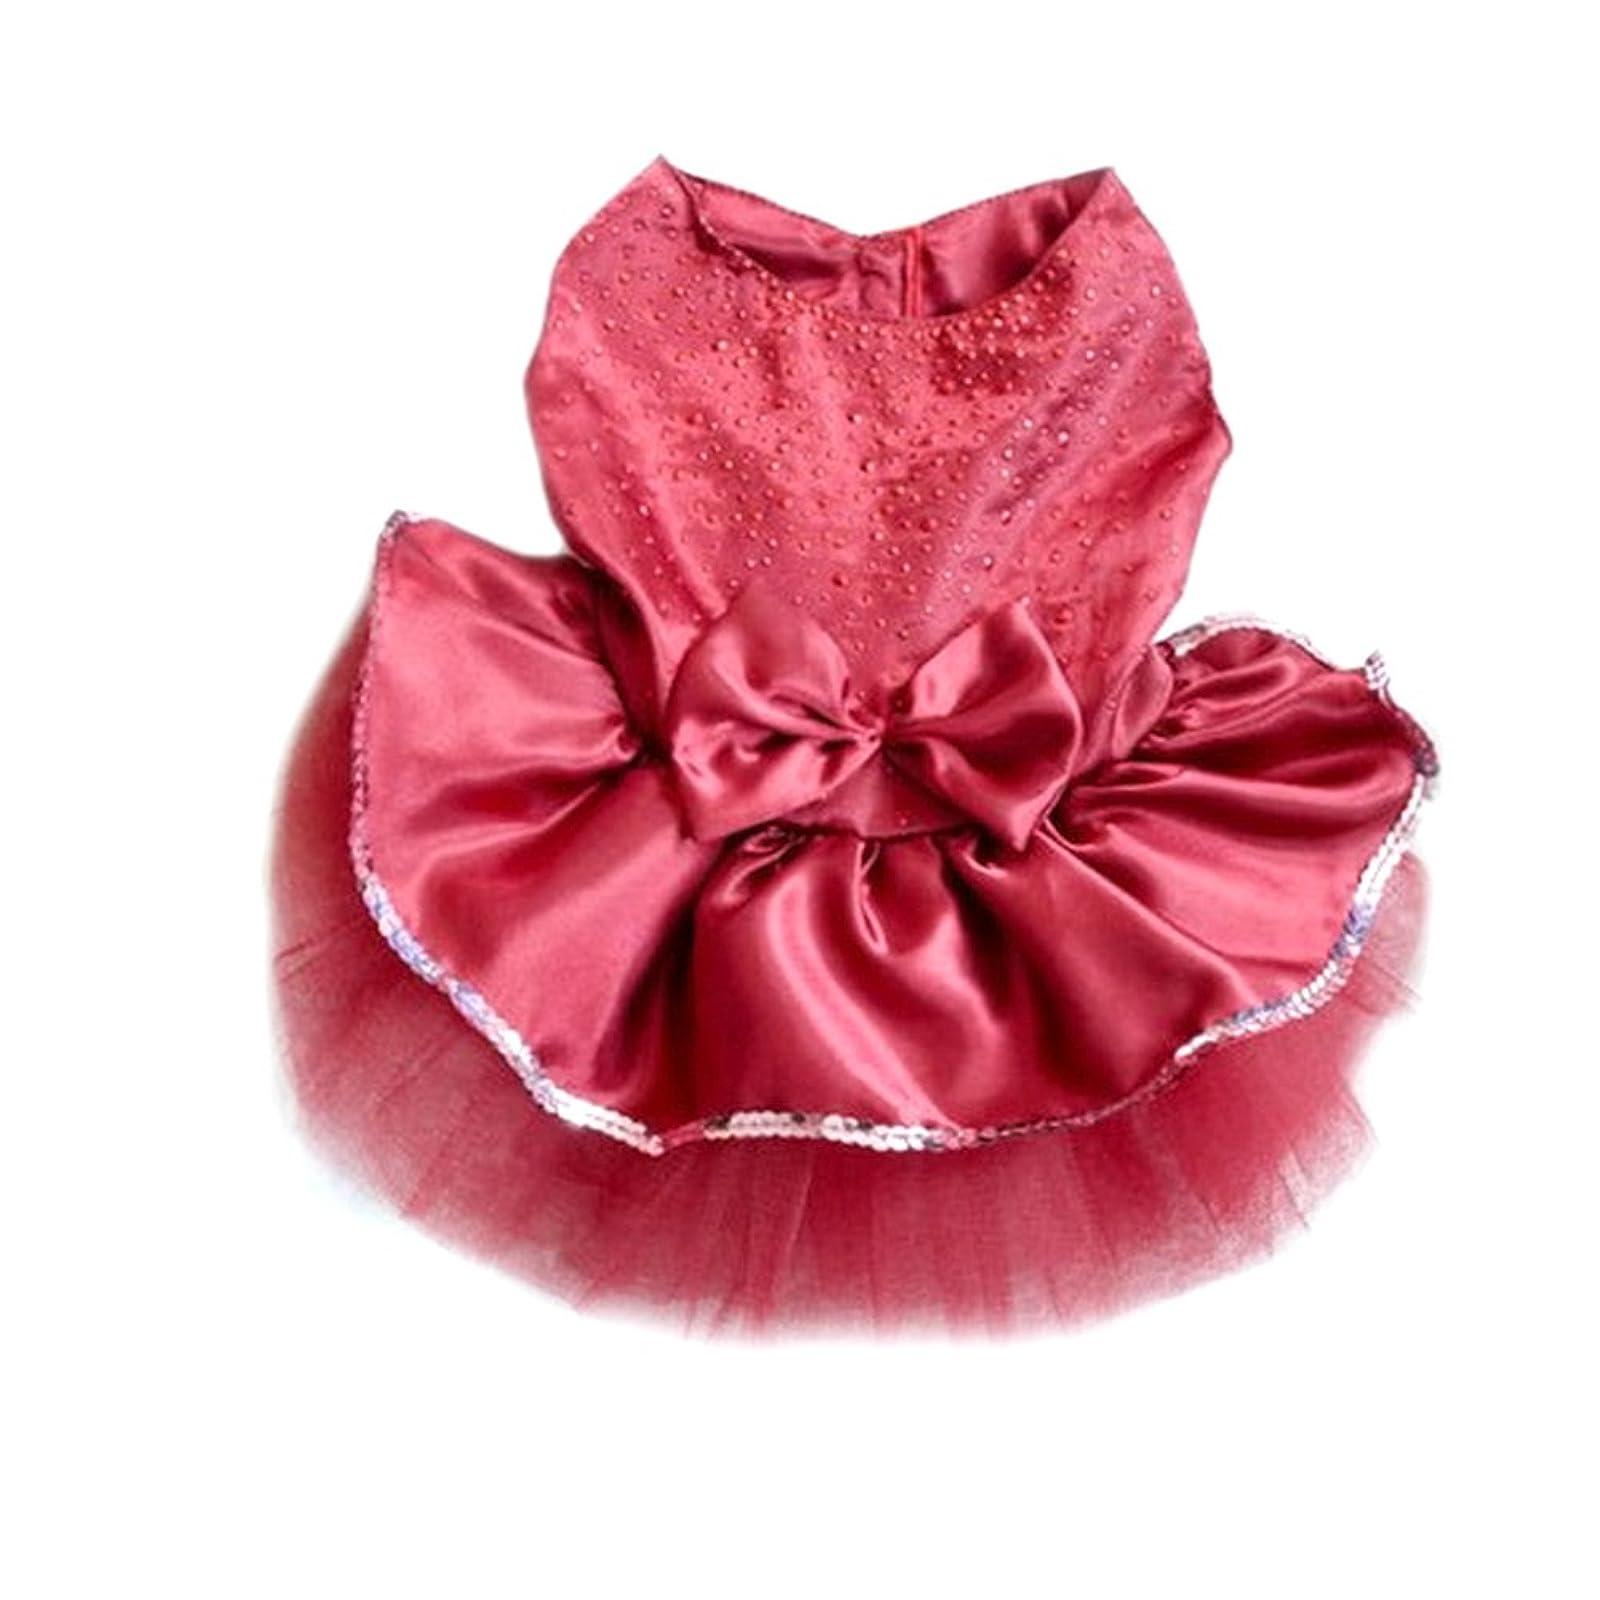 PanDaDa Dog Daisy Gauze Tutu Dress Skirt Dark Red L(Tag:XL) - 2